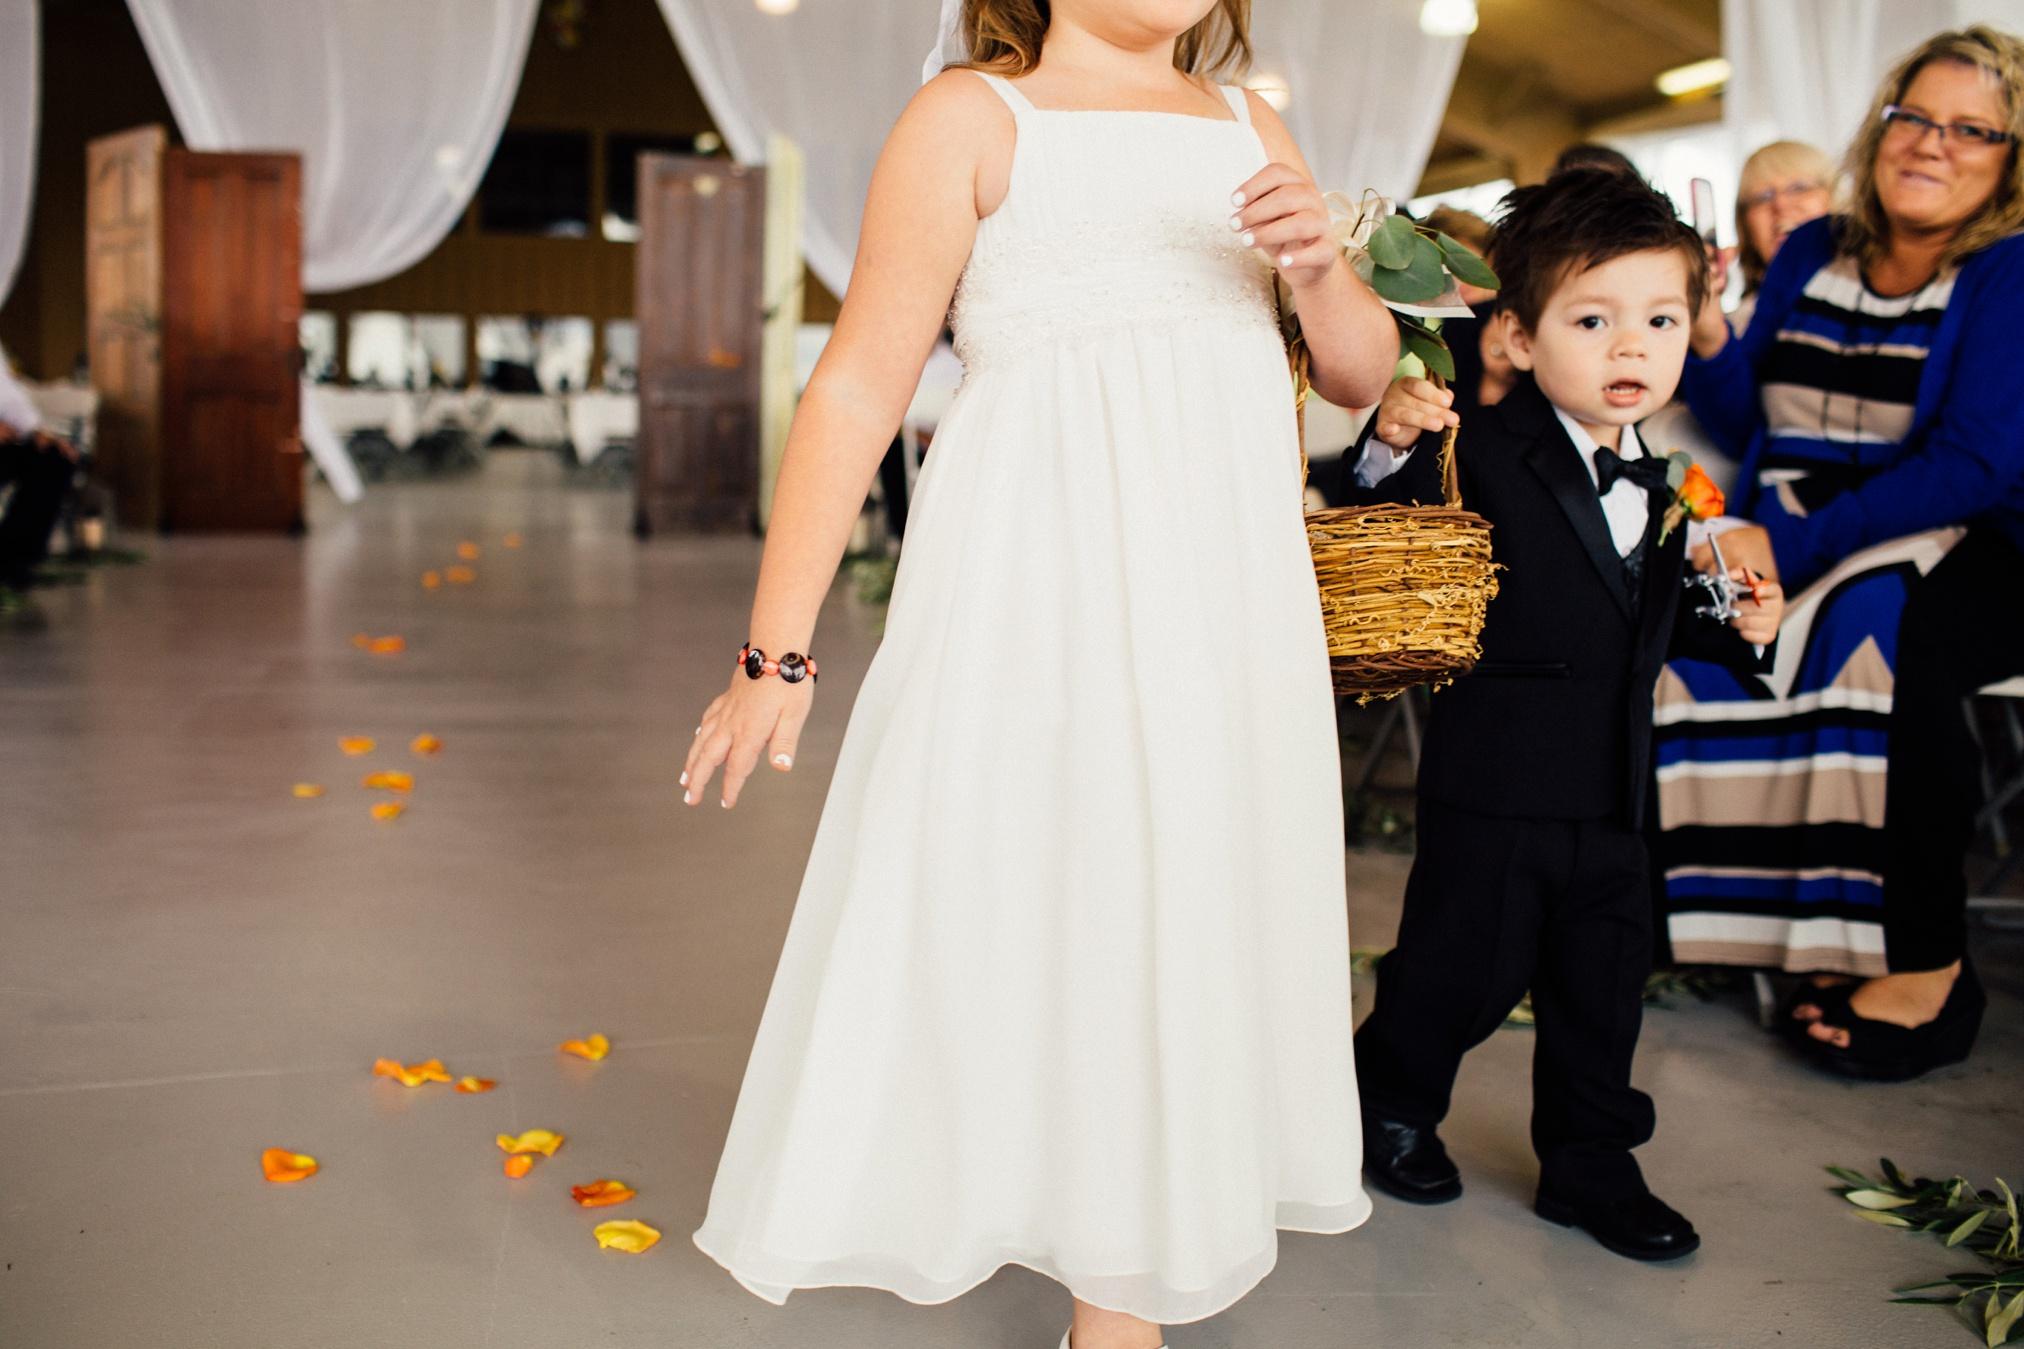 schmid_wedding-365.jpg